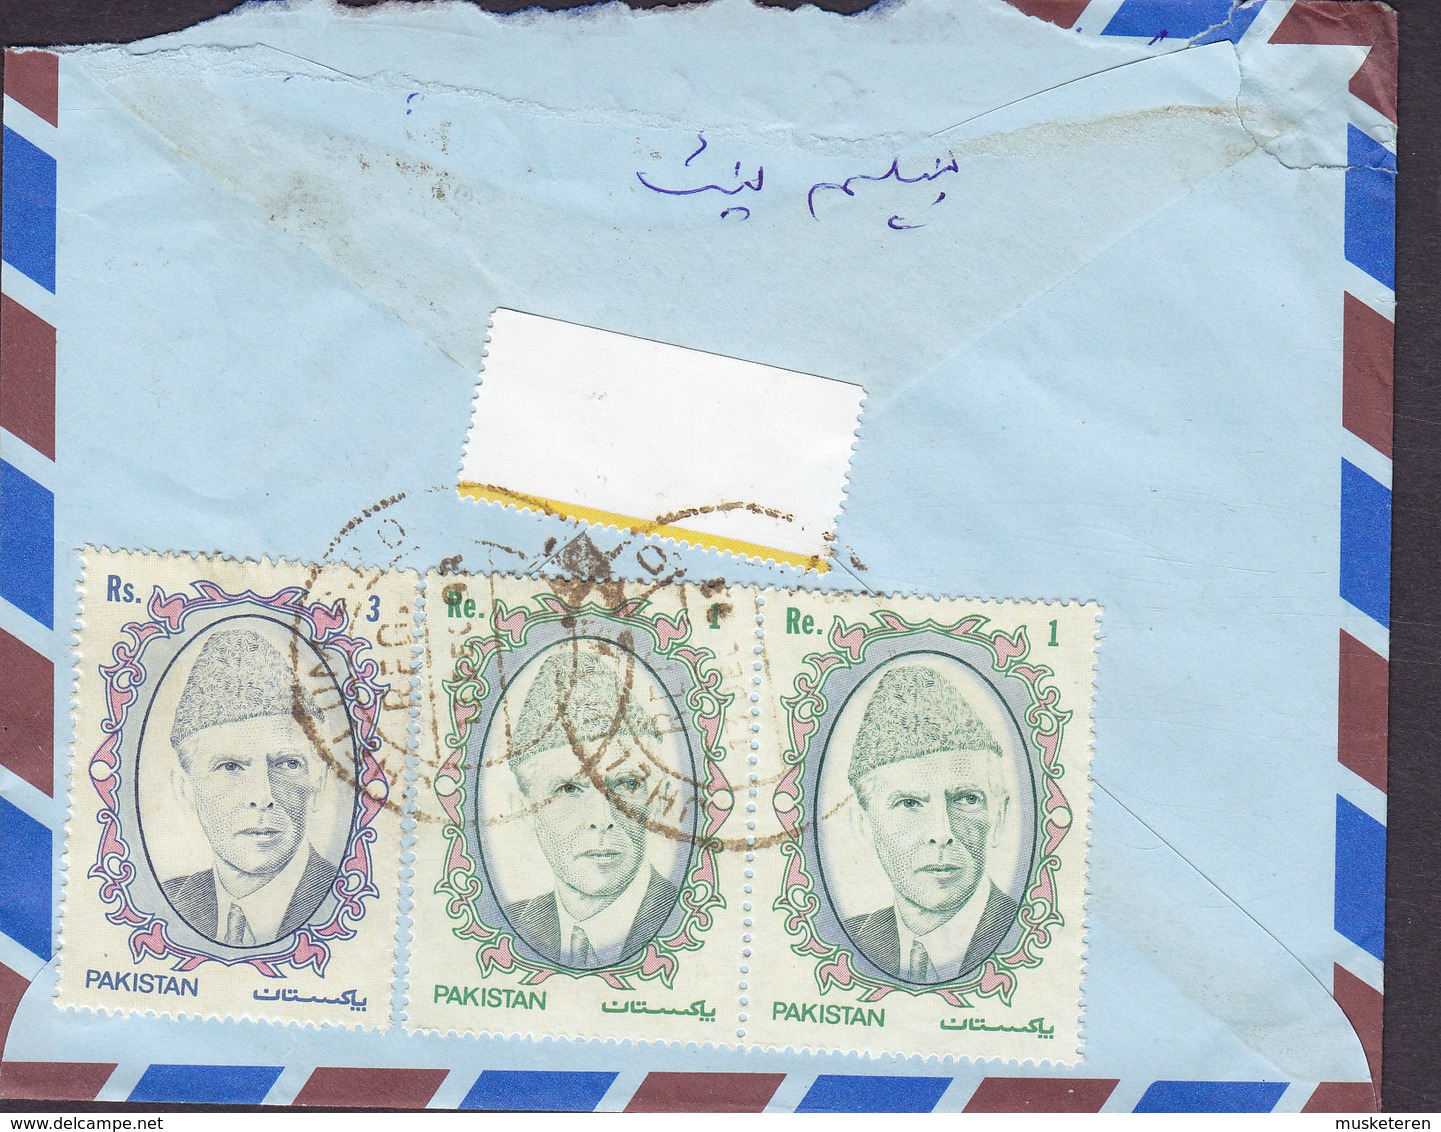 Pakistan Uprated Postal Stationery Ganzsache Entier Registered Recommandé JHELUM G.P.O. 1993 World Food Day FAO Stamp - Pakistan